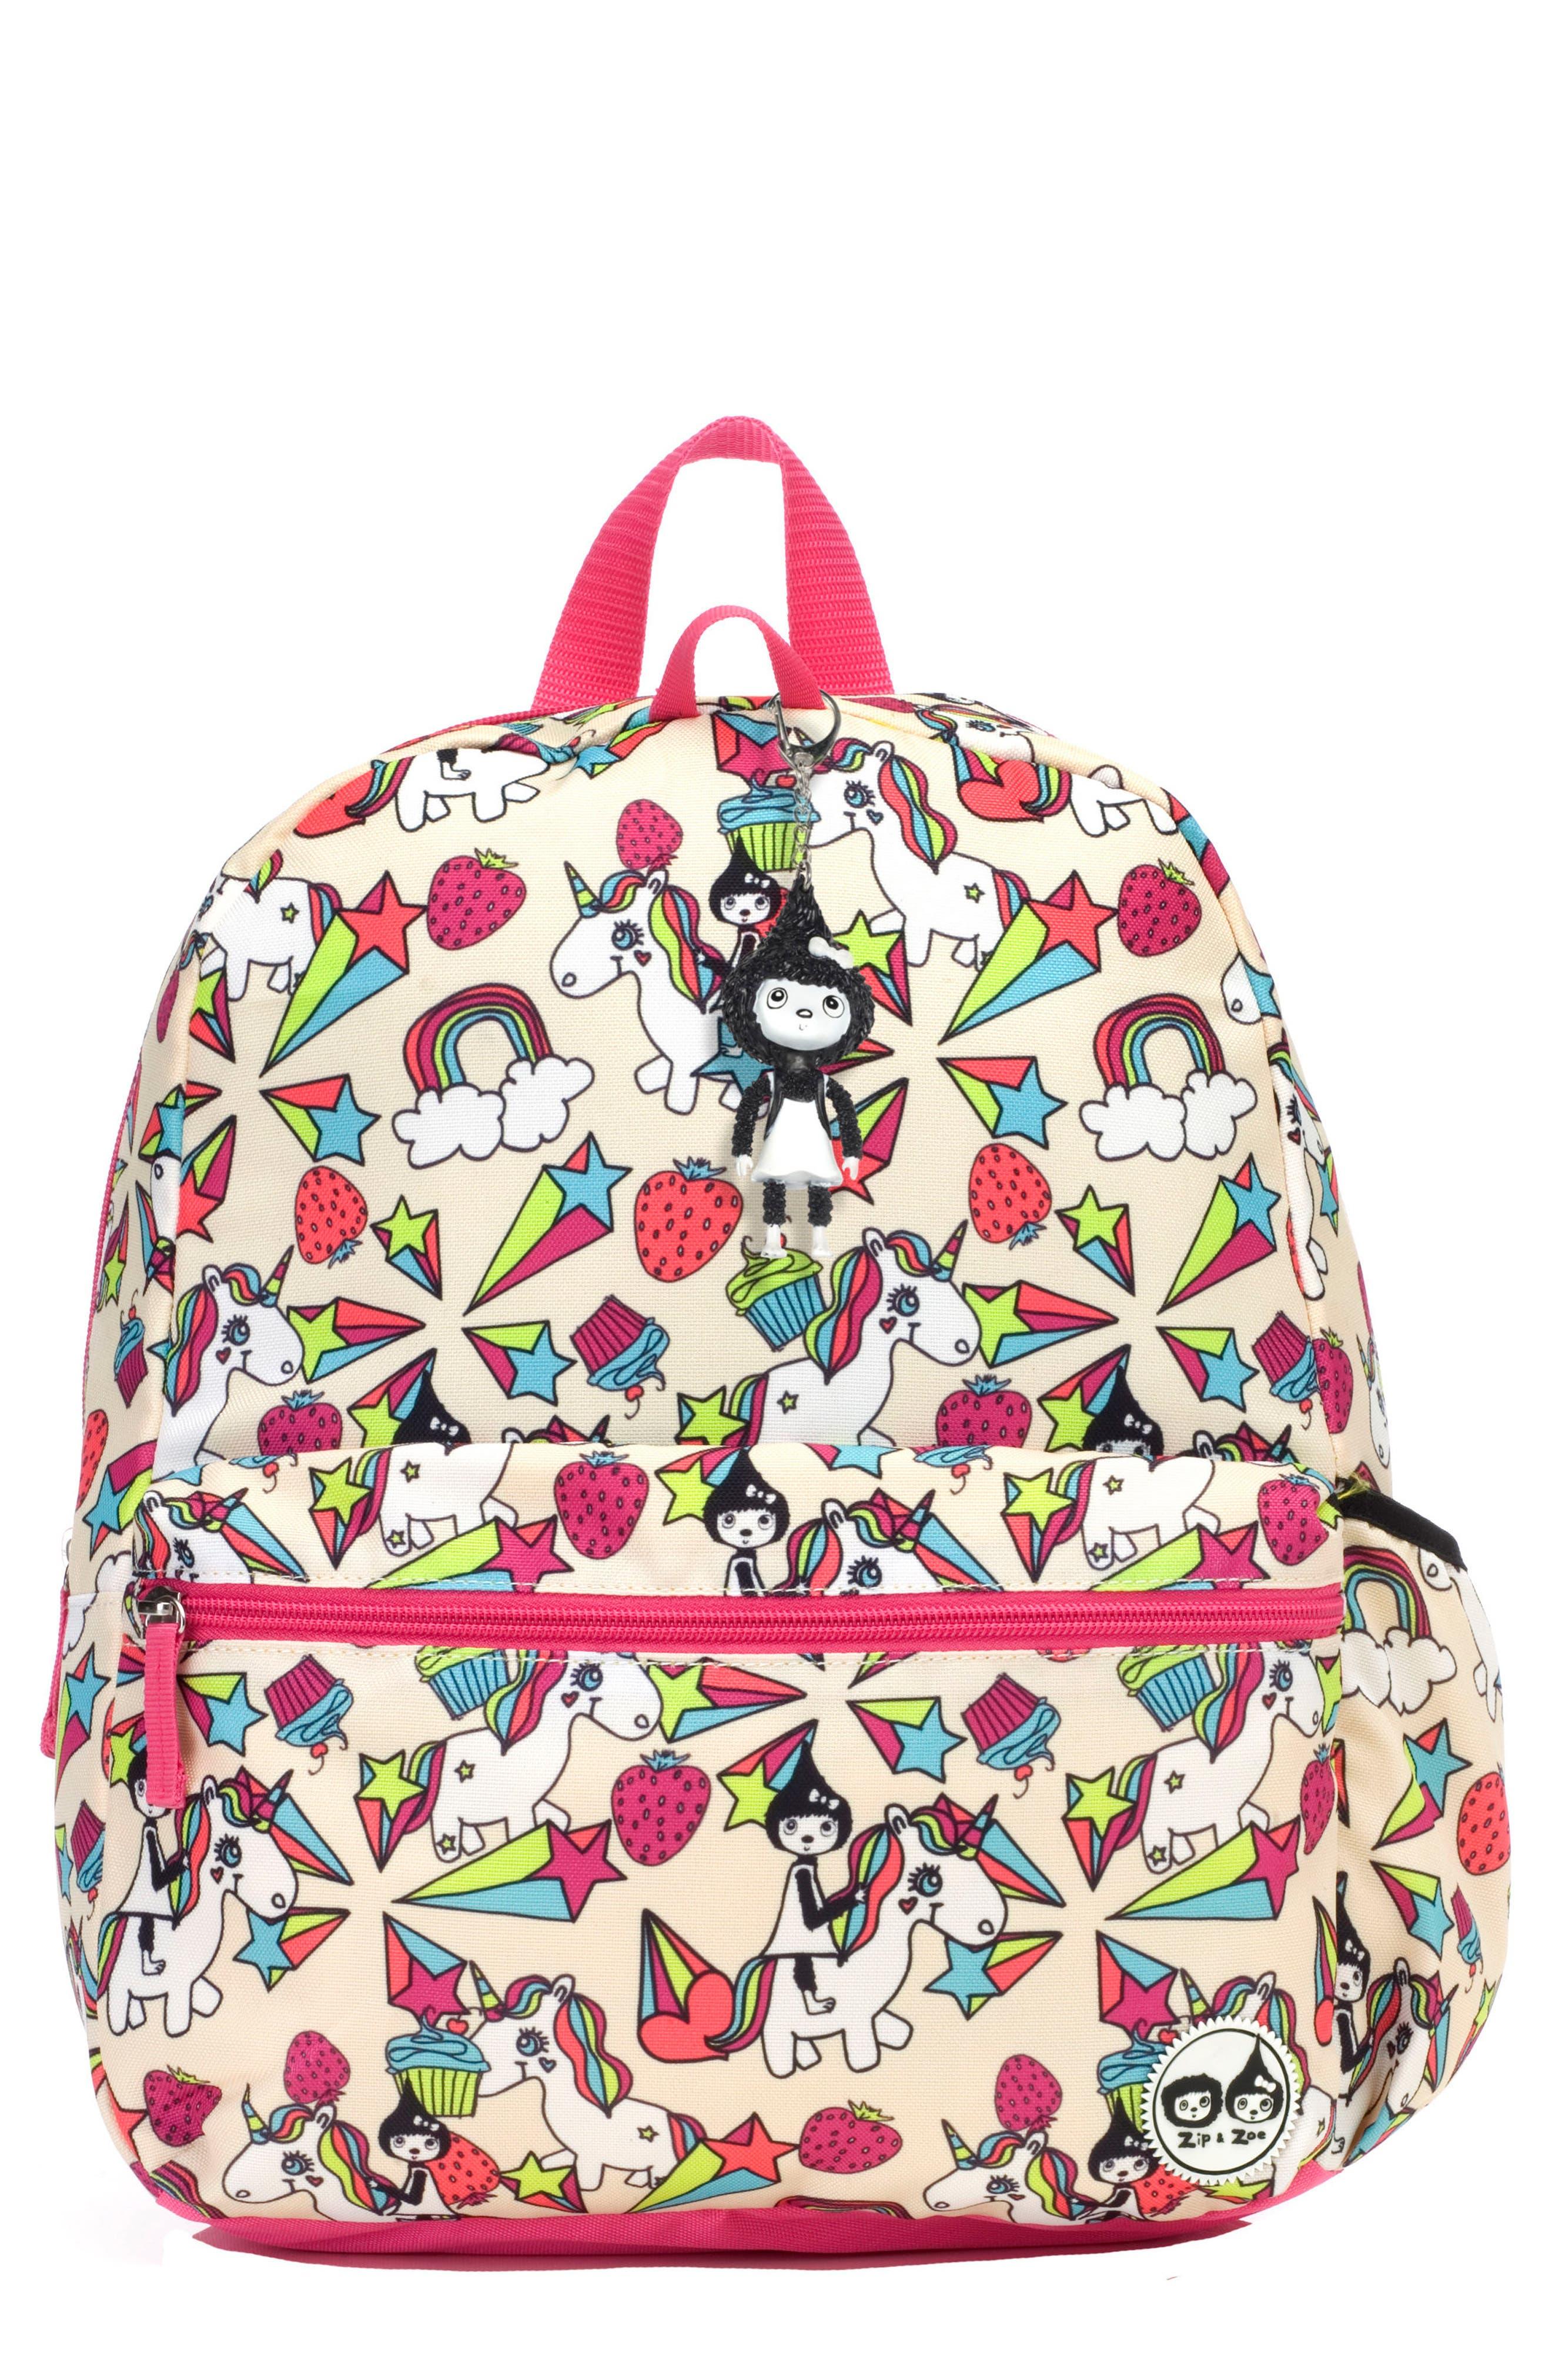 Zip & Zoe Unicorn Junior Backpack,                             Main thumbnail 1, color,                             WHITE